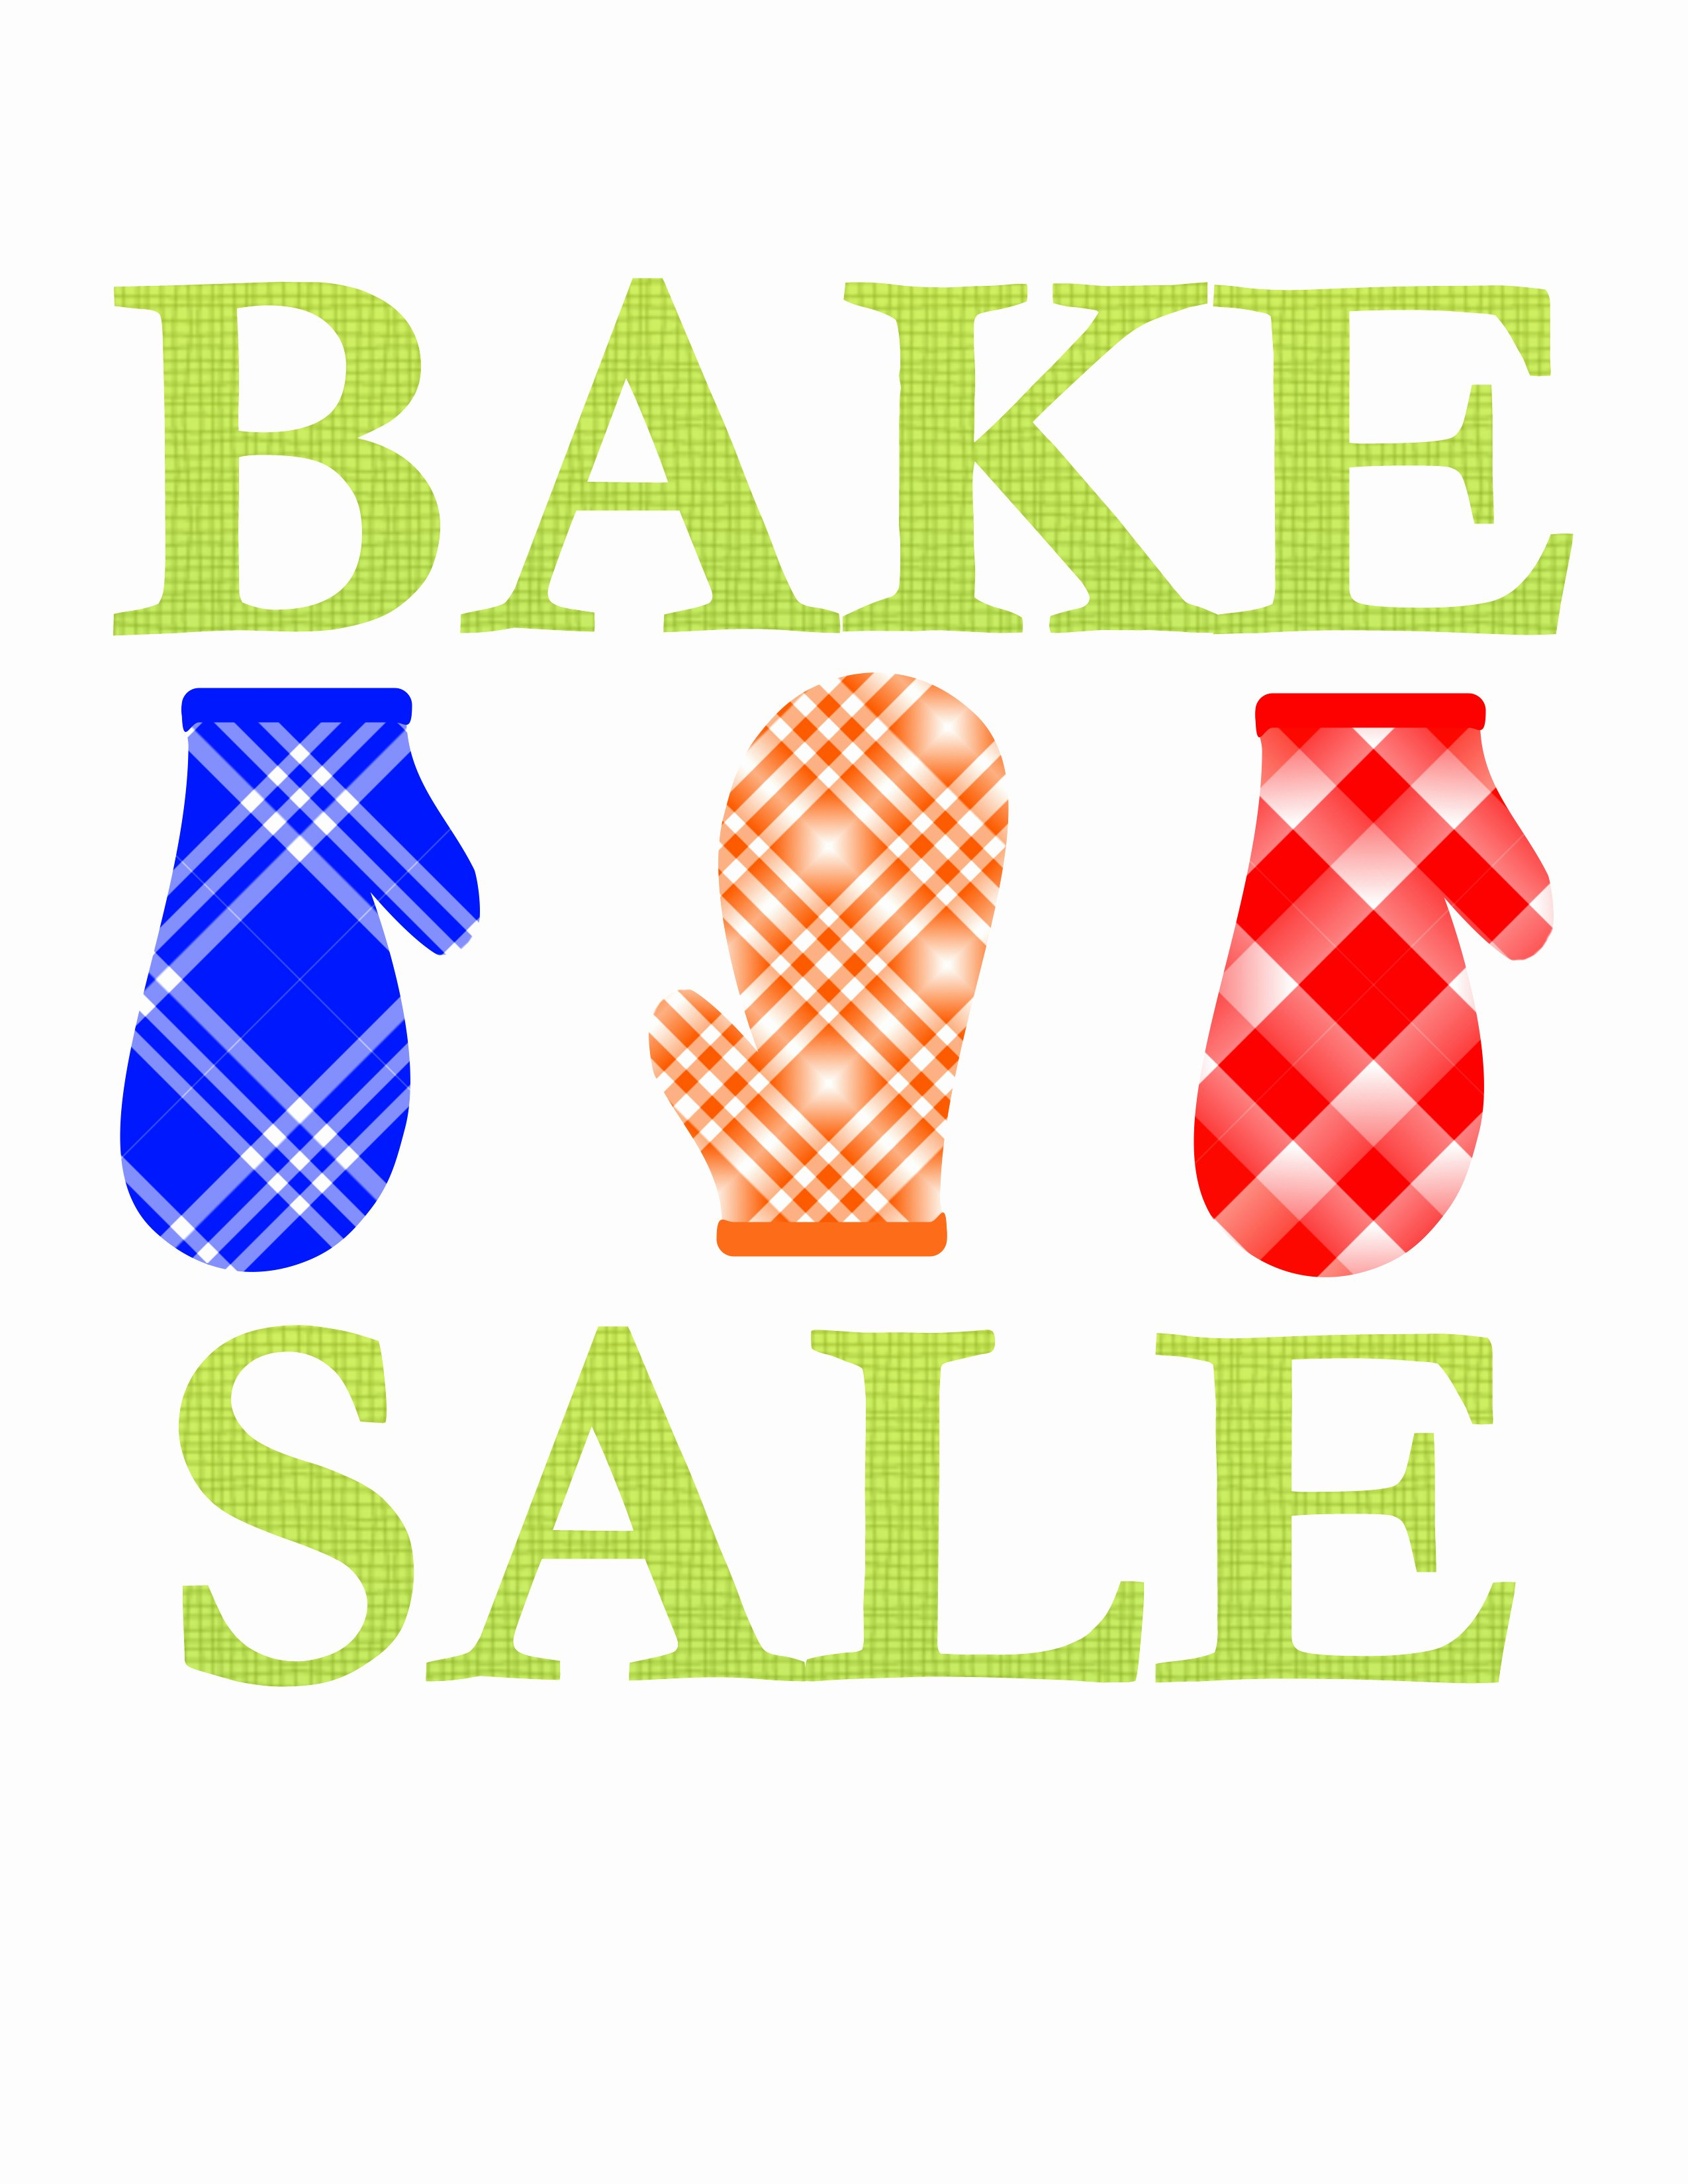 Free Bake Sale Template Lovely Bake Sale Flyer Flyer Template and Bake Sale On Pinterest